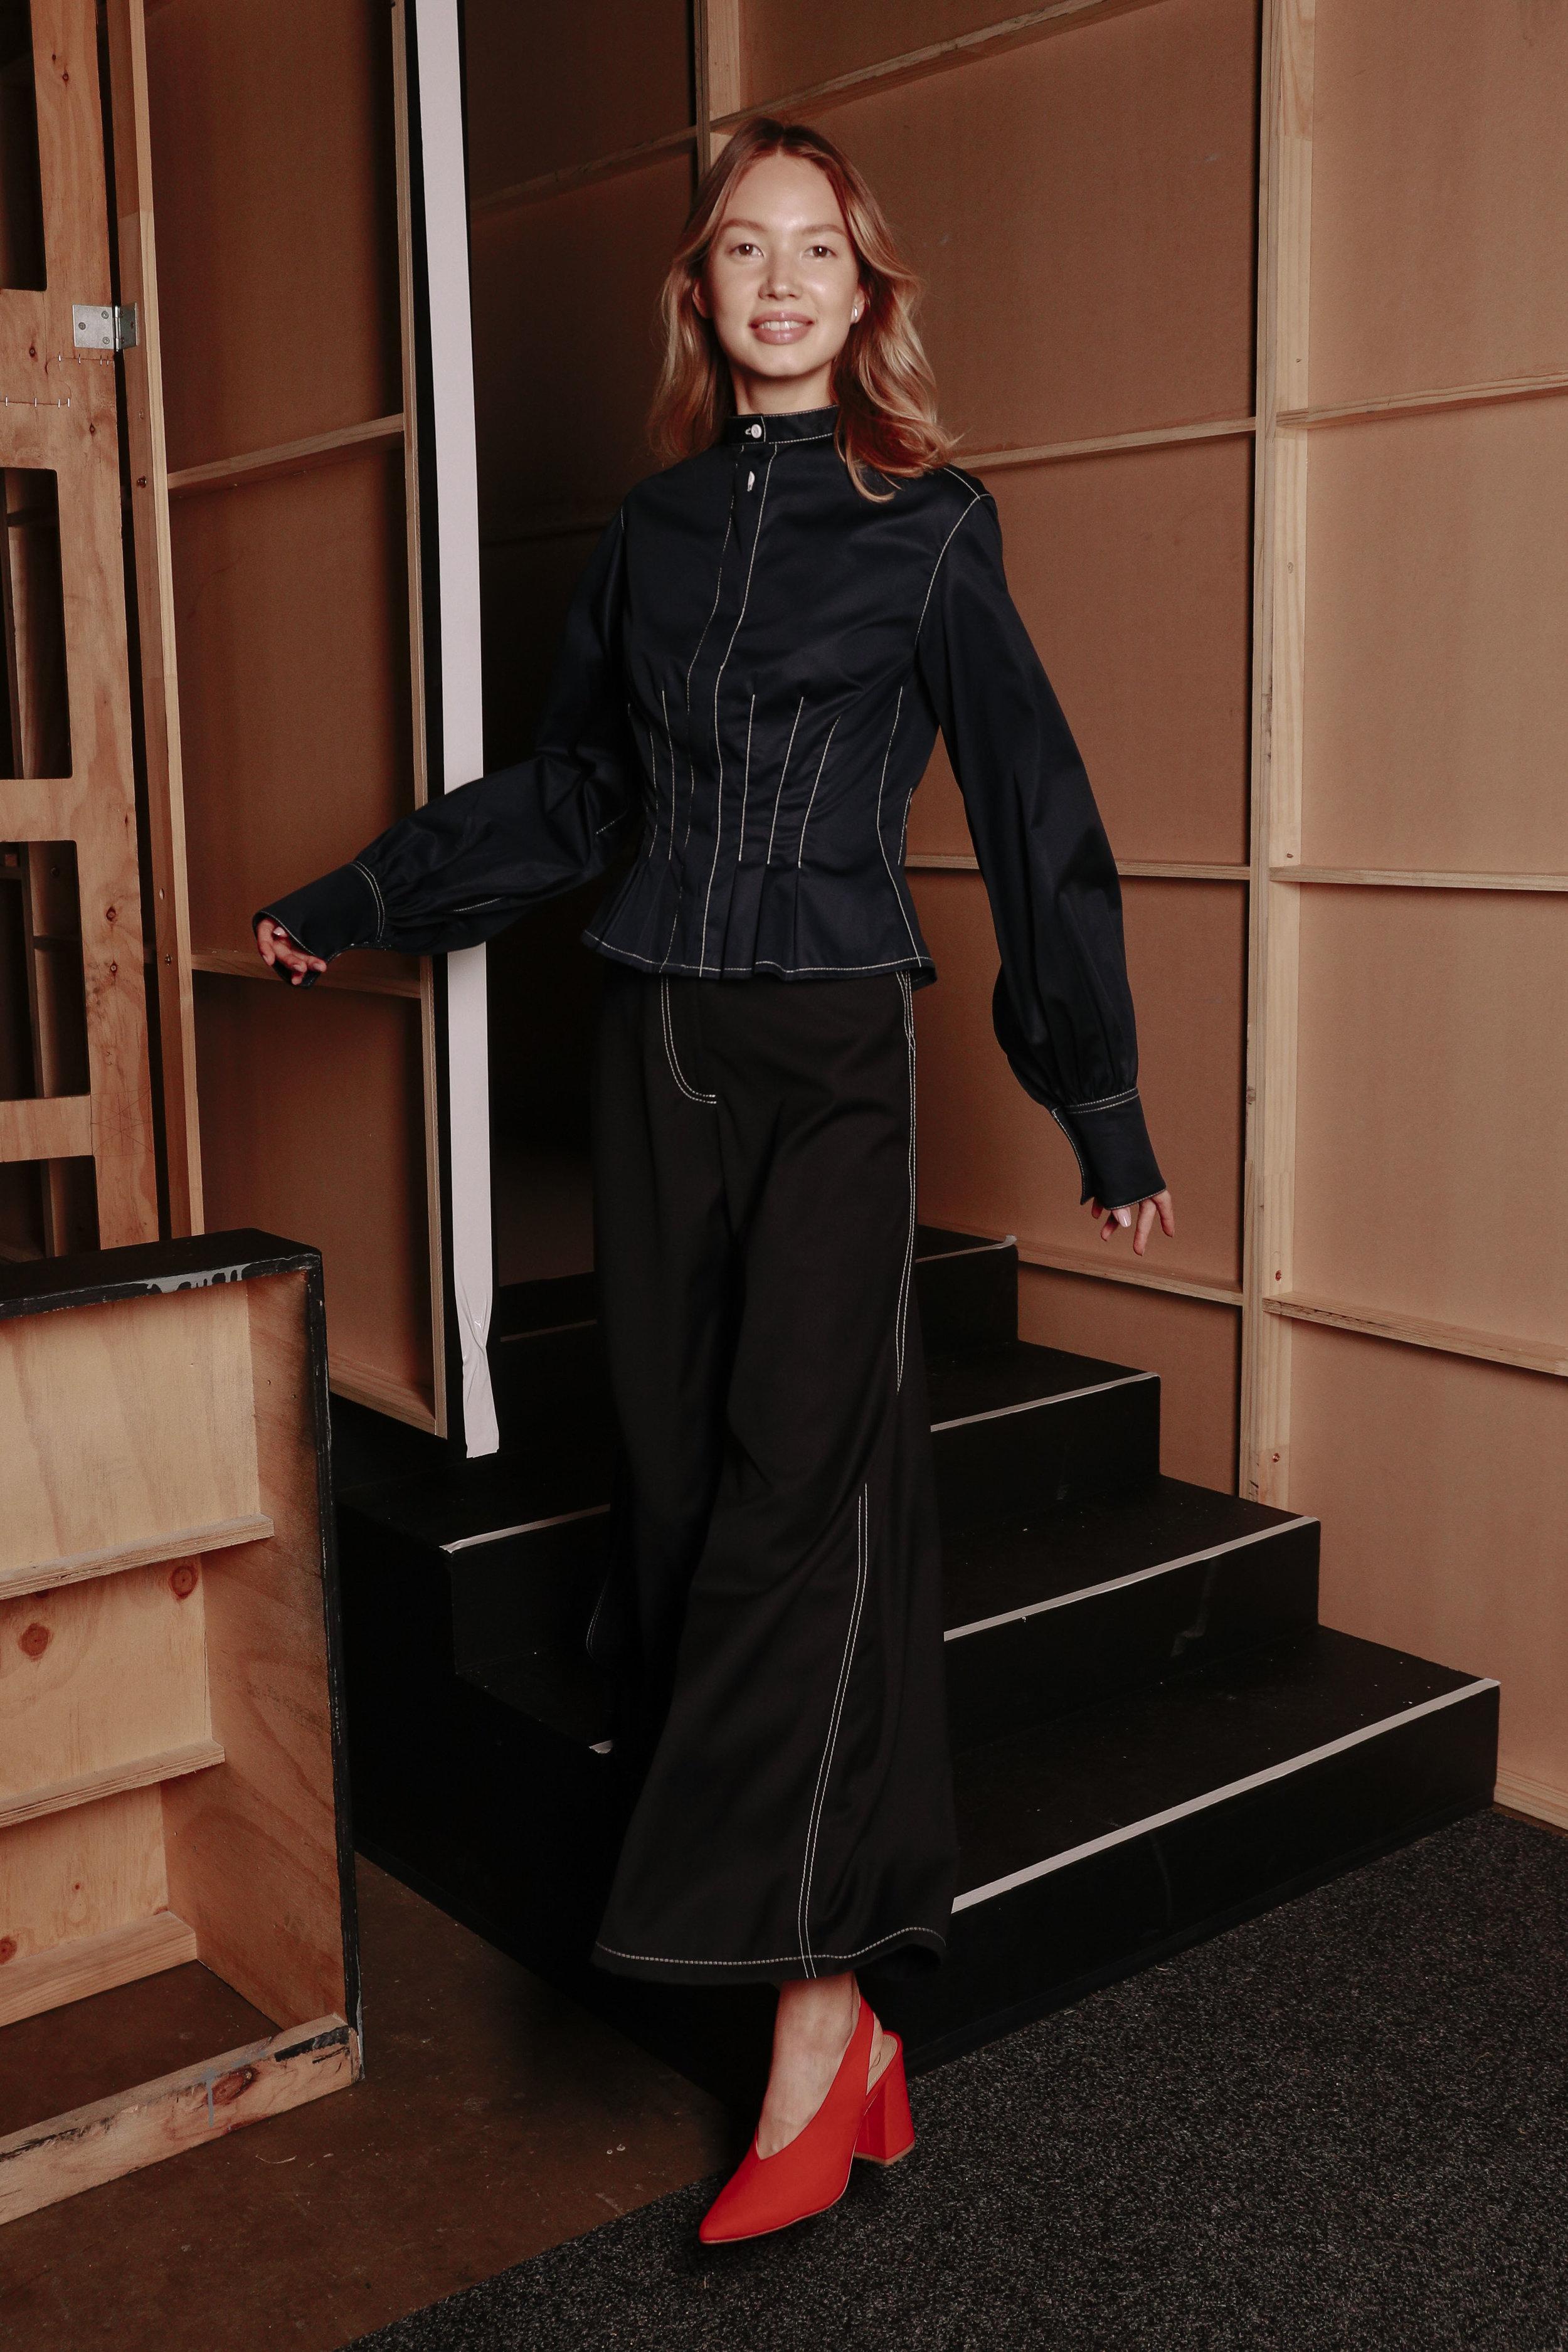 to wear - Announced finalists bt emerging fashion designer award video